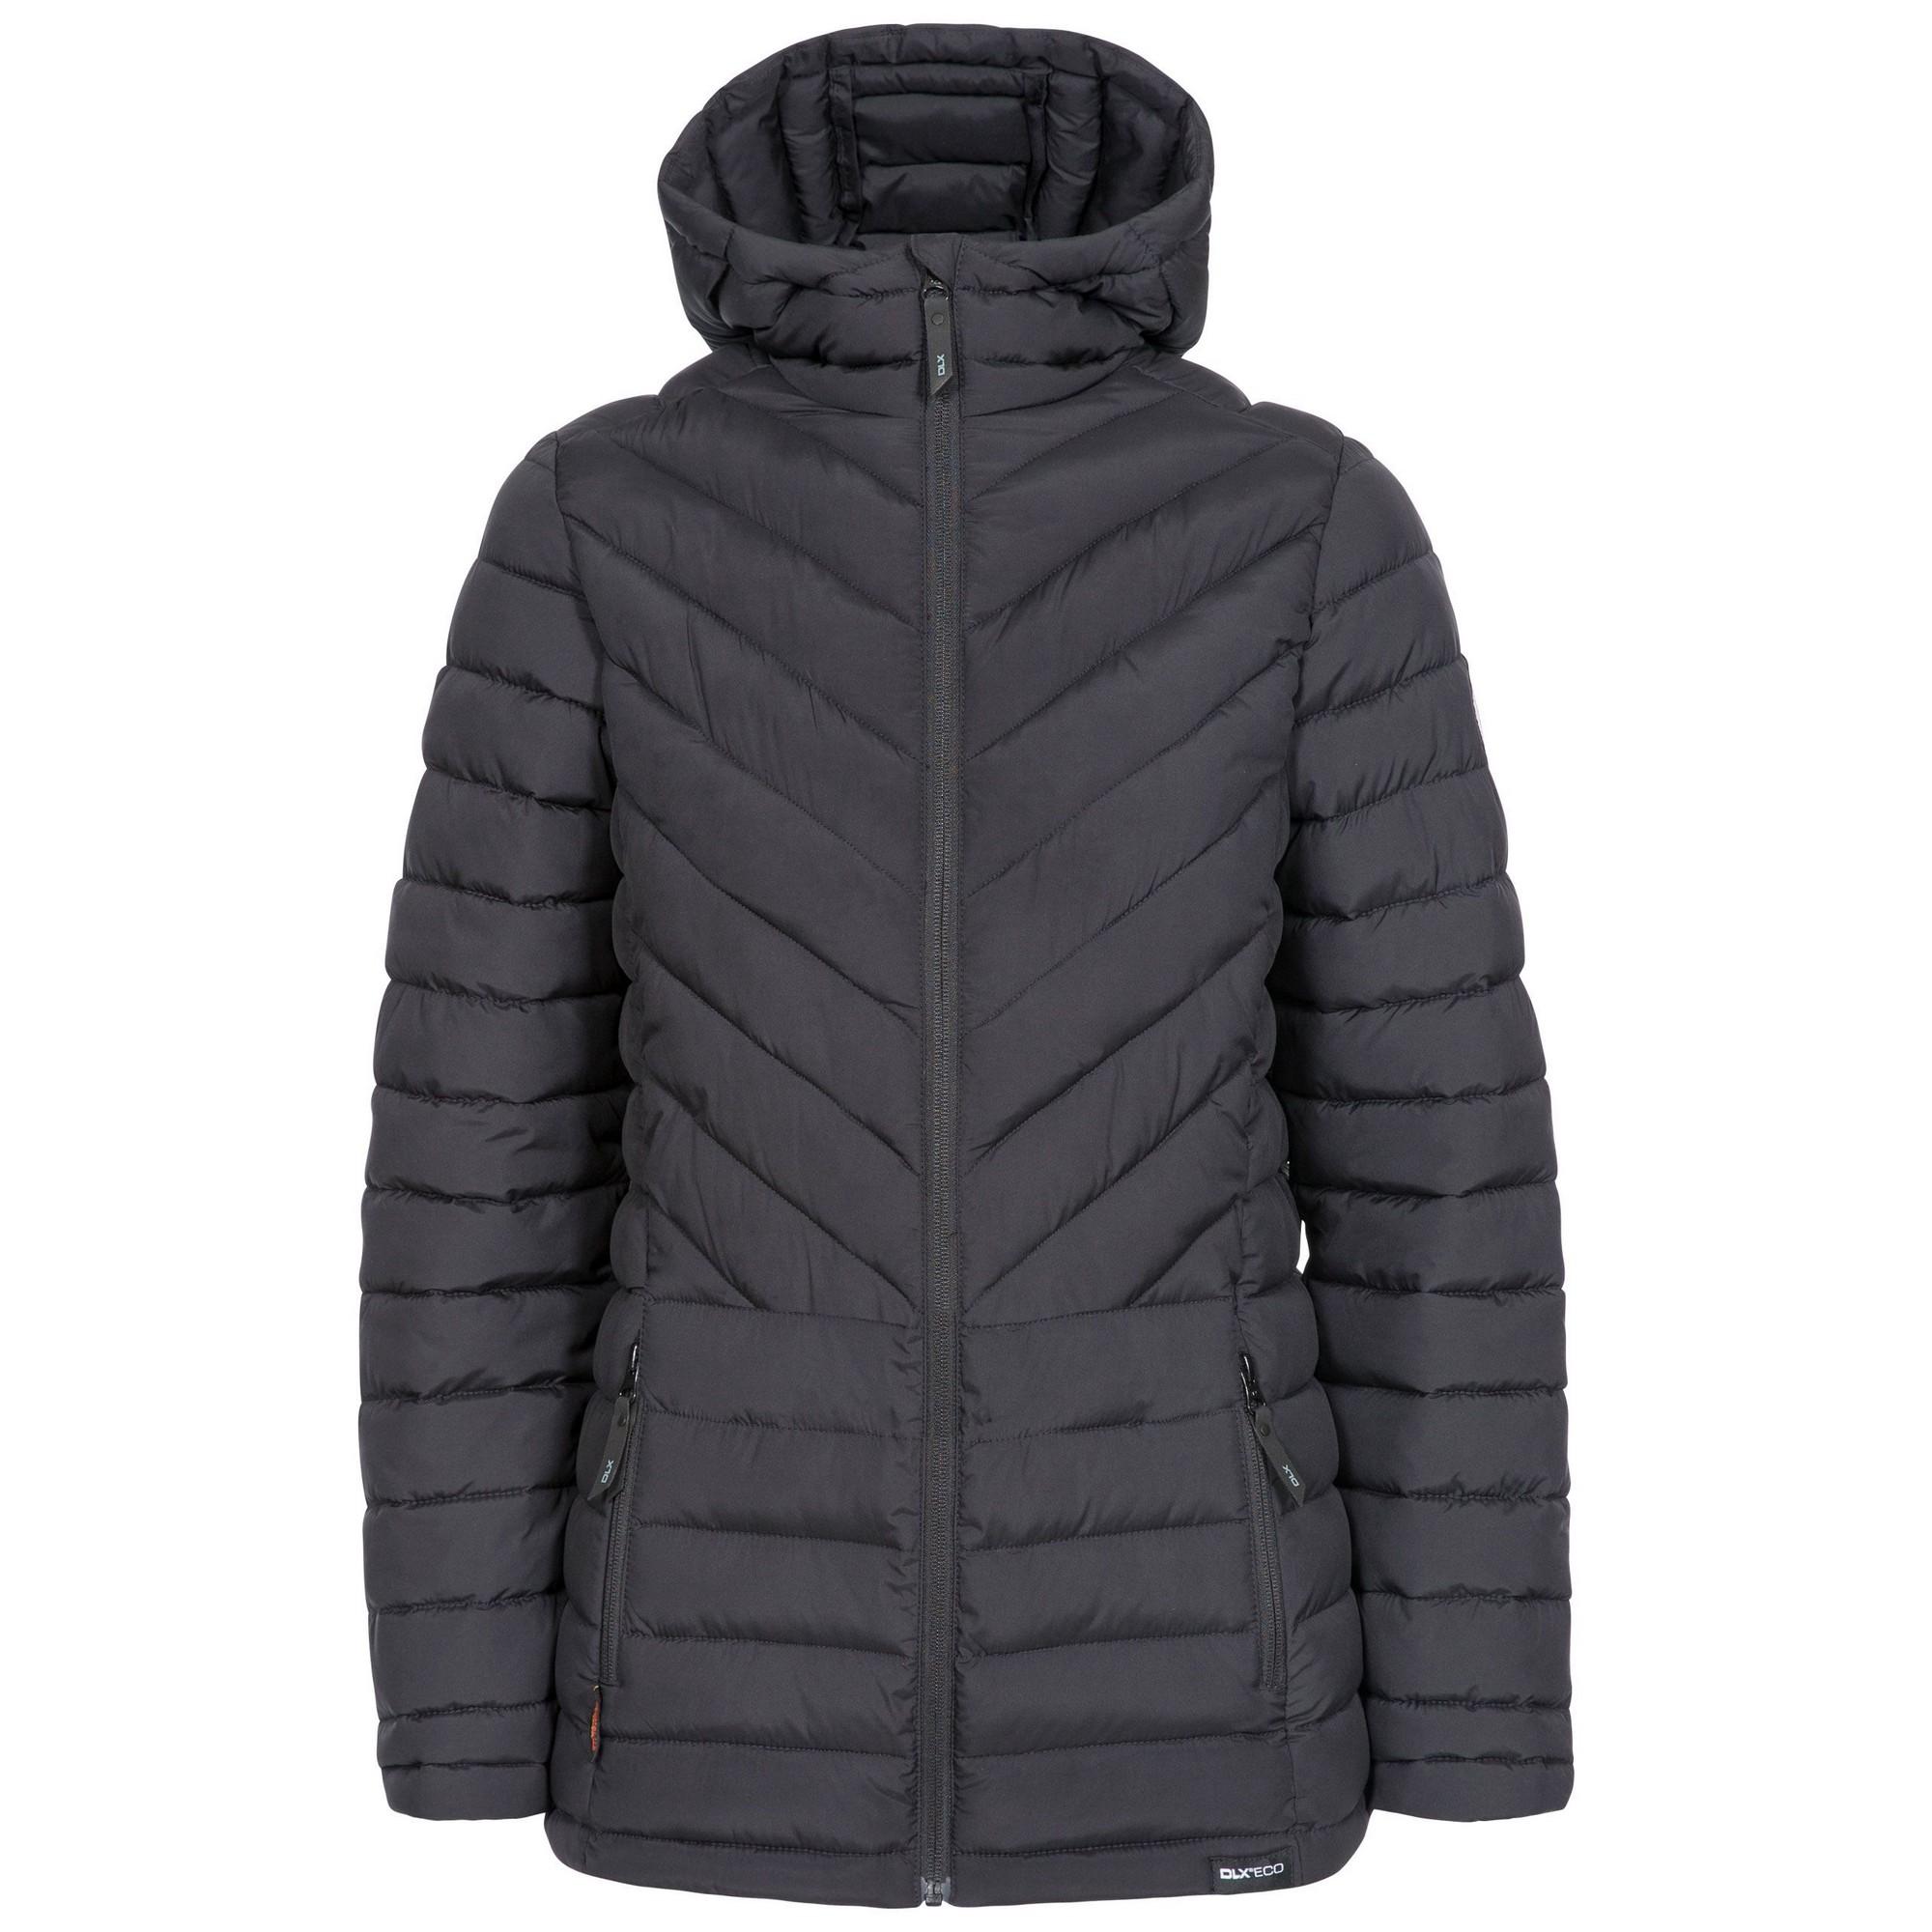 Trespass Womens/Ladies DLX Padded Jacket (XL) (Black)